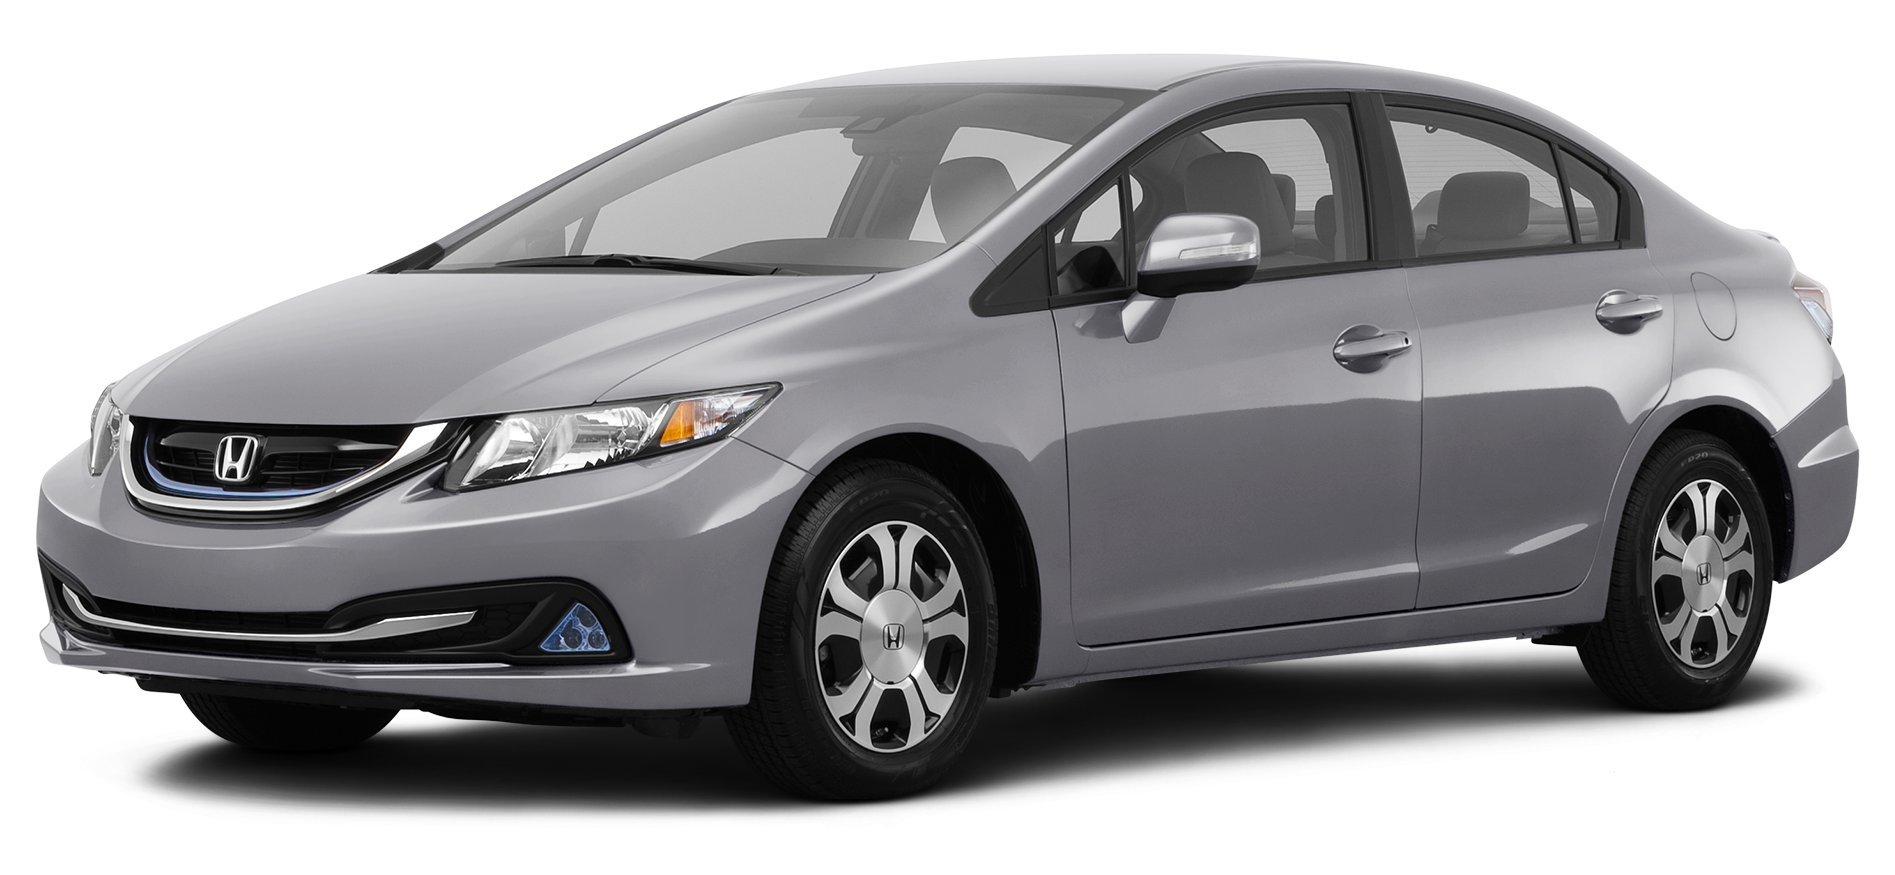 2013 Civic Sedan: Amazon.com: 2013 Honda Civic Reviews, Images, And Specs